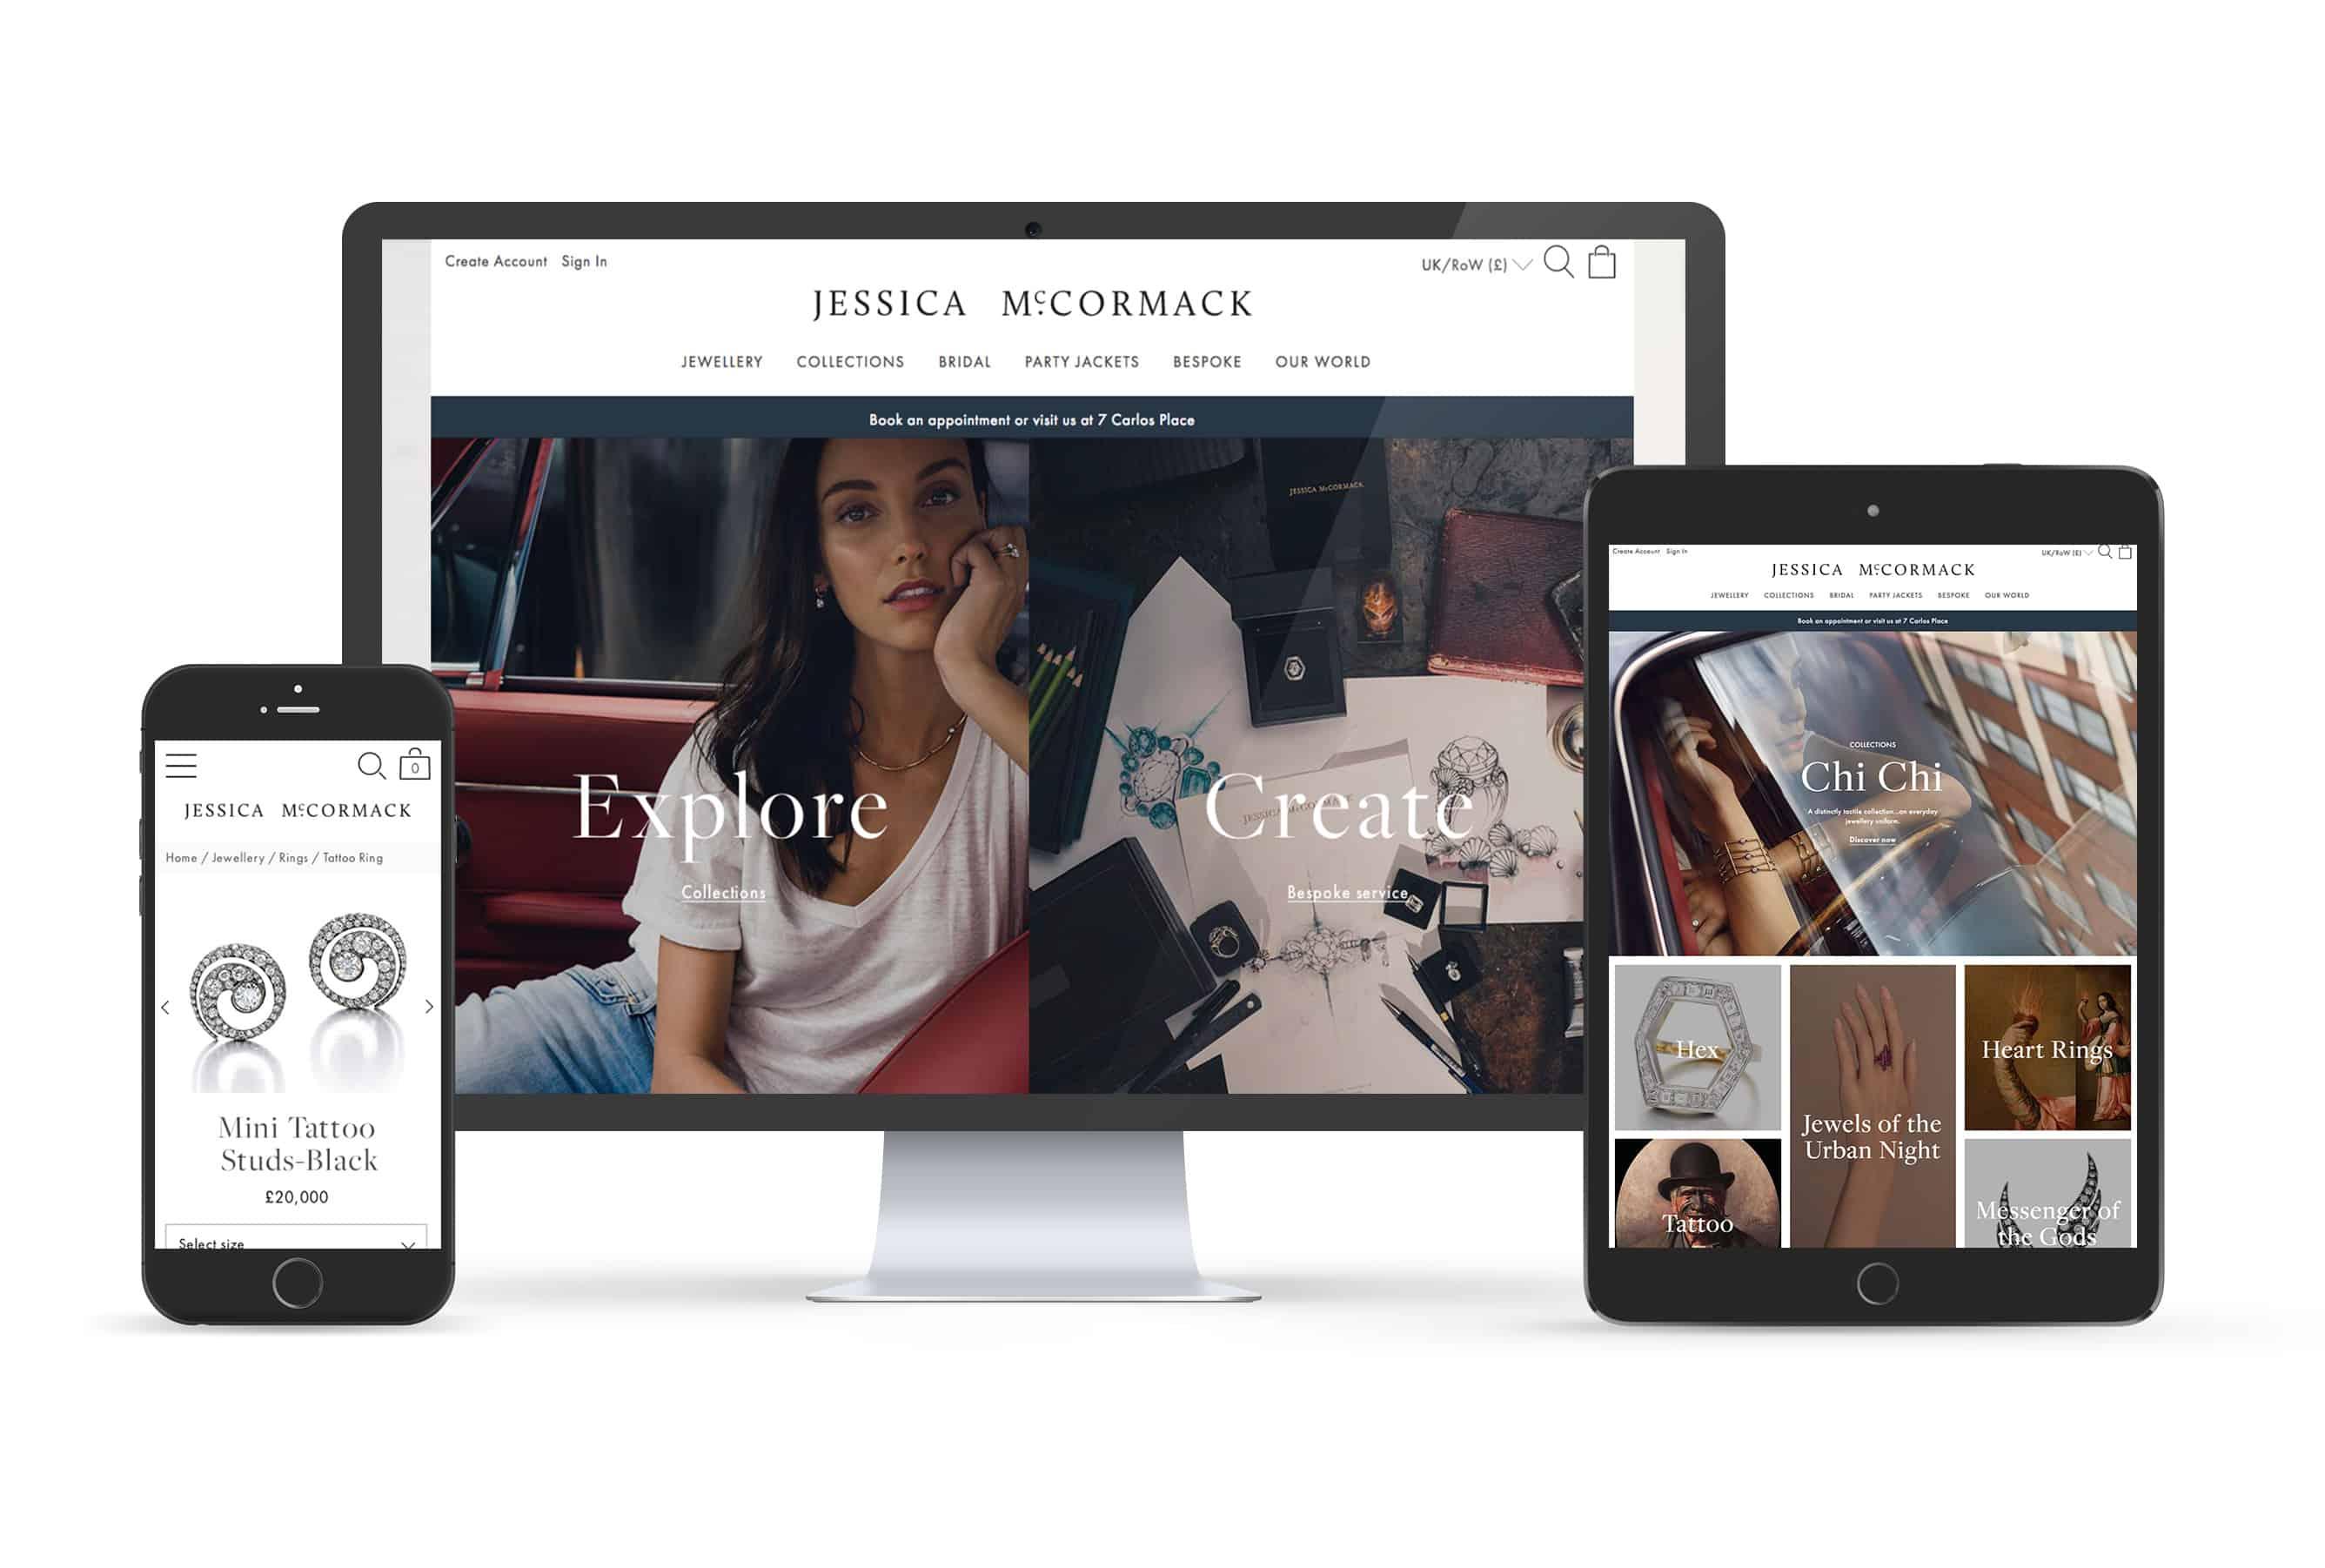 Jessica McCormack website design responsive views